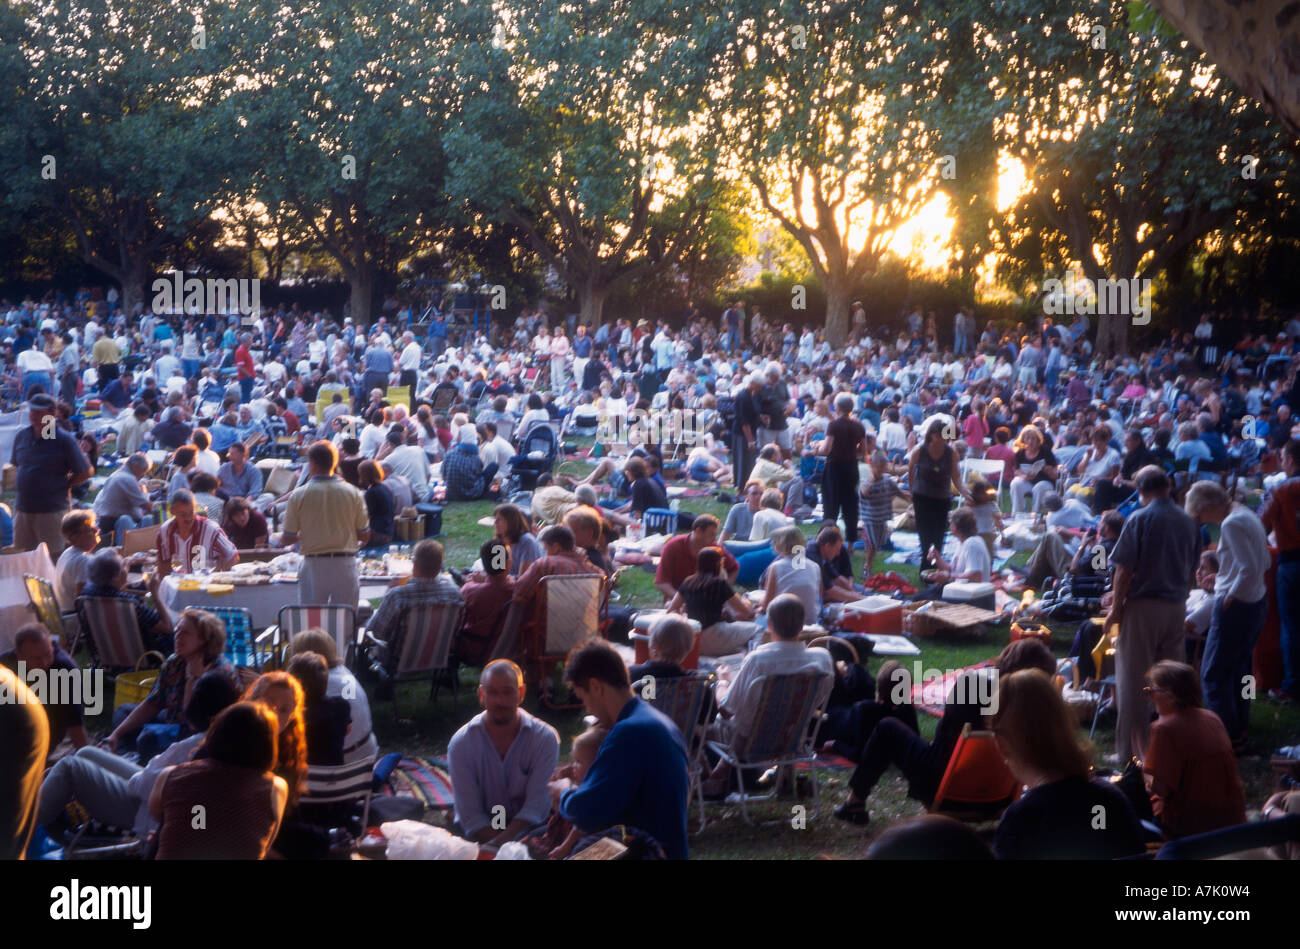 Melbourne, Park Concert - Stock Image